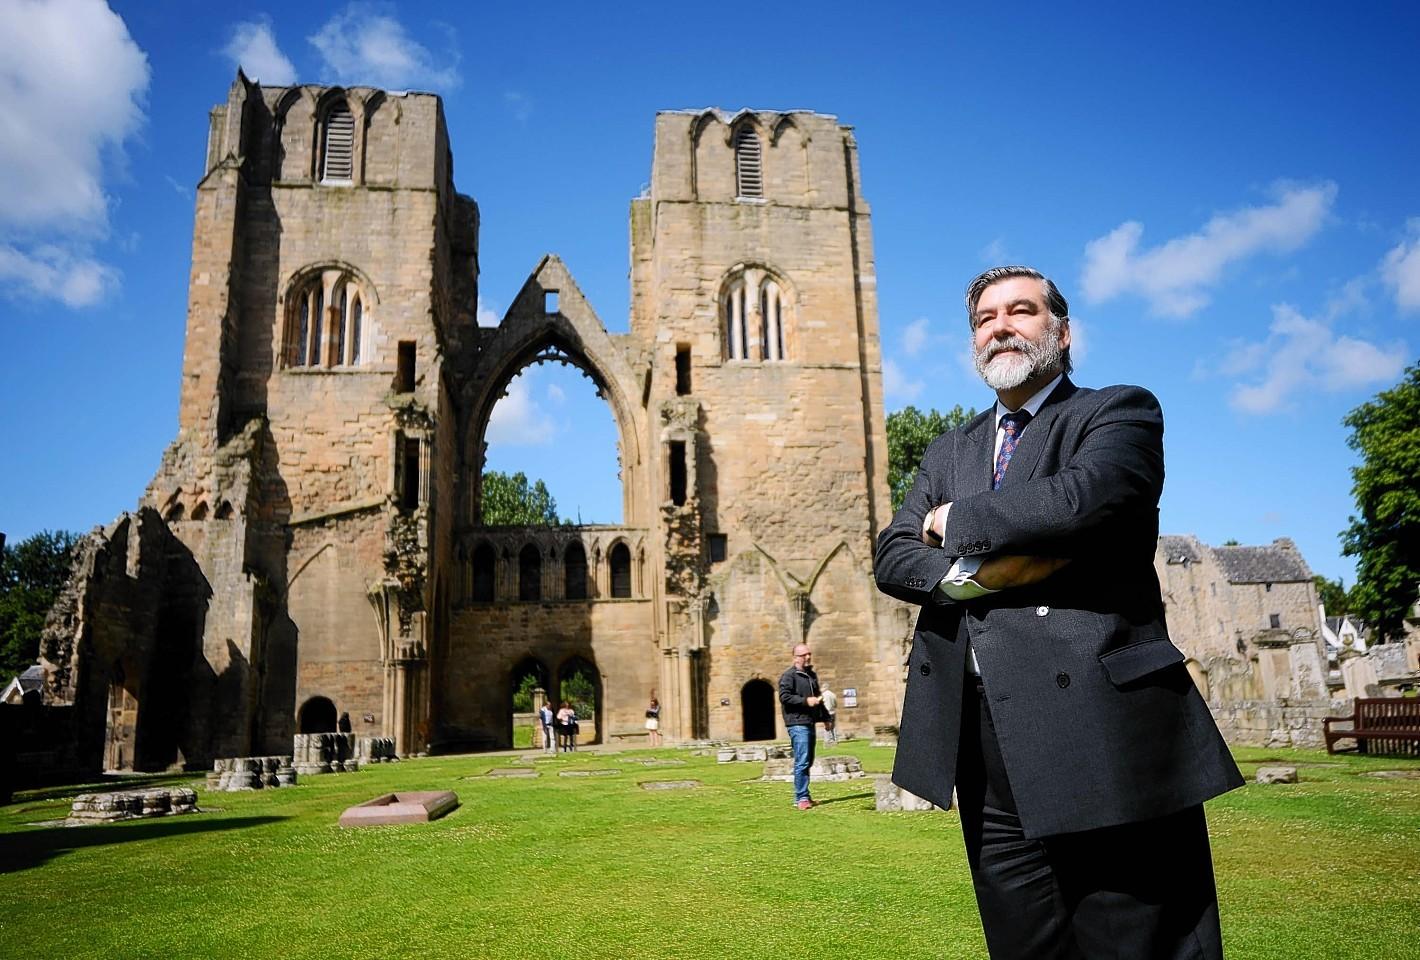 Visit Scotland Chairman, Lord John Thurso at Elgin Cathedral in Moray.